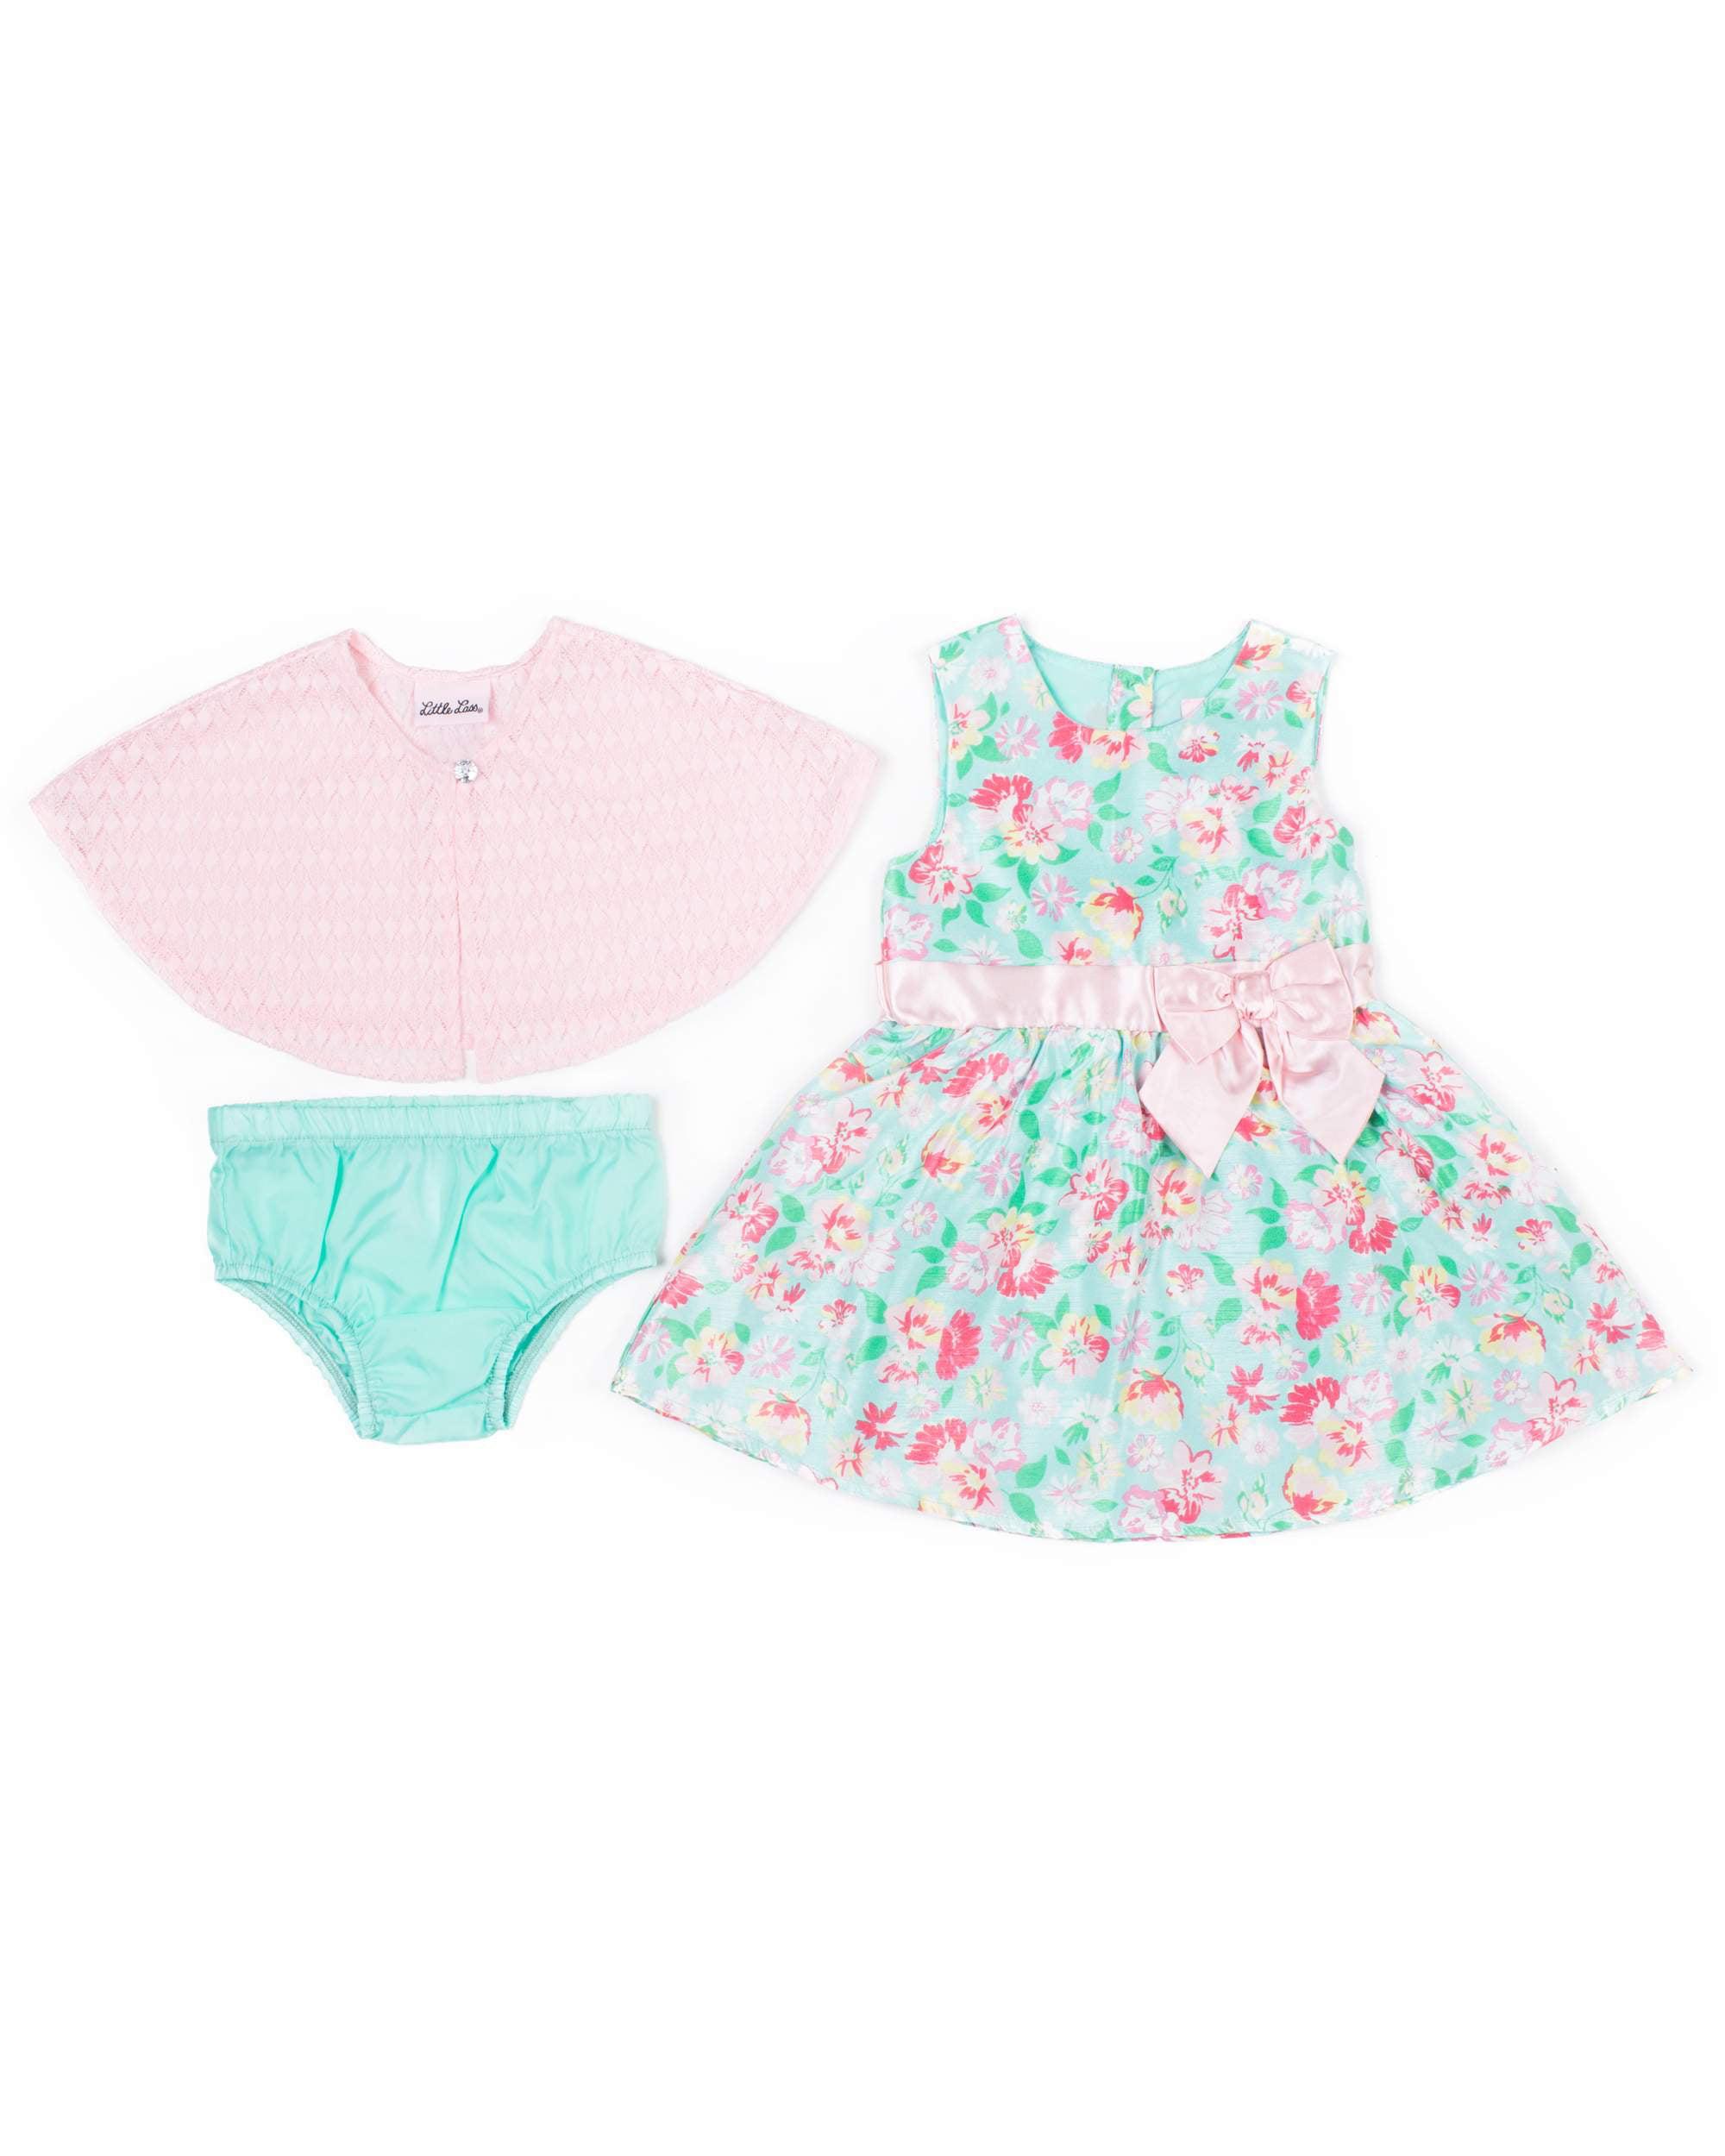 Printed Floral Shantung Dress & Knit Shrug, 2pc Outfit Set (Baby Girls & Toddler Girls)